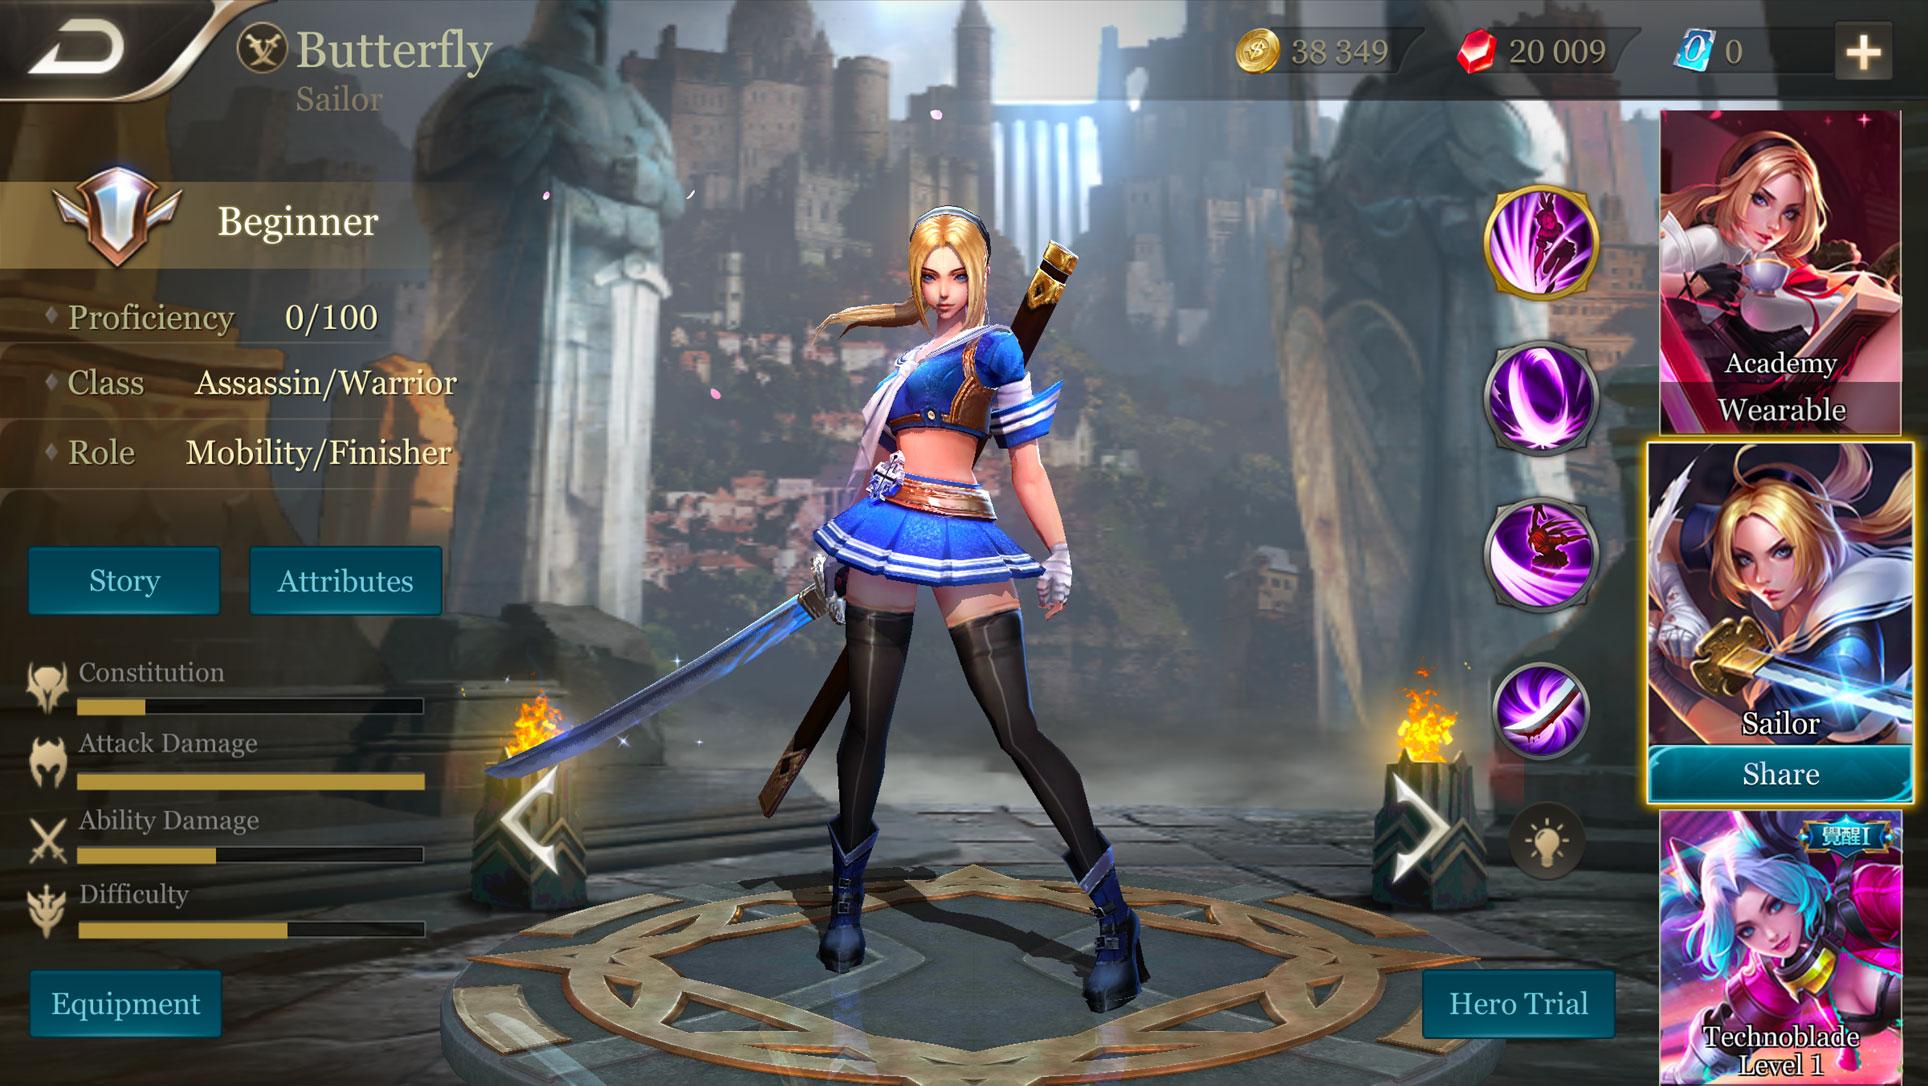 Arena of Valor, Garena, Malaysia, Tencent Games, Mobile, MOBA, multiplayer online battle arena